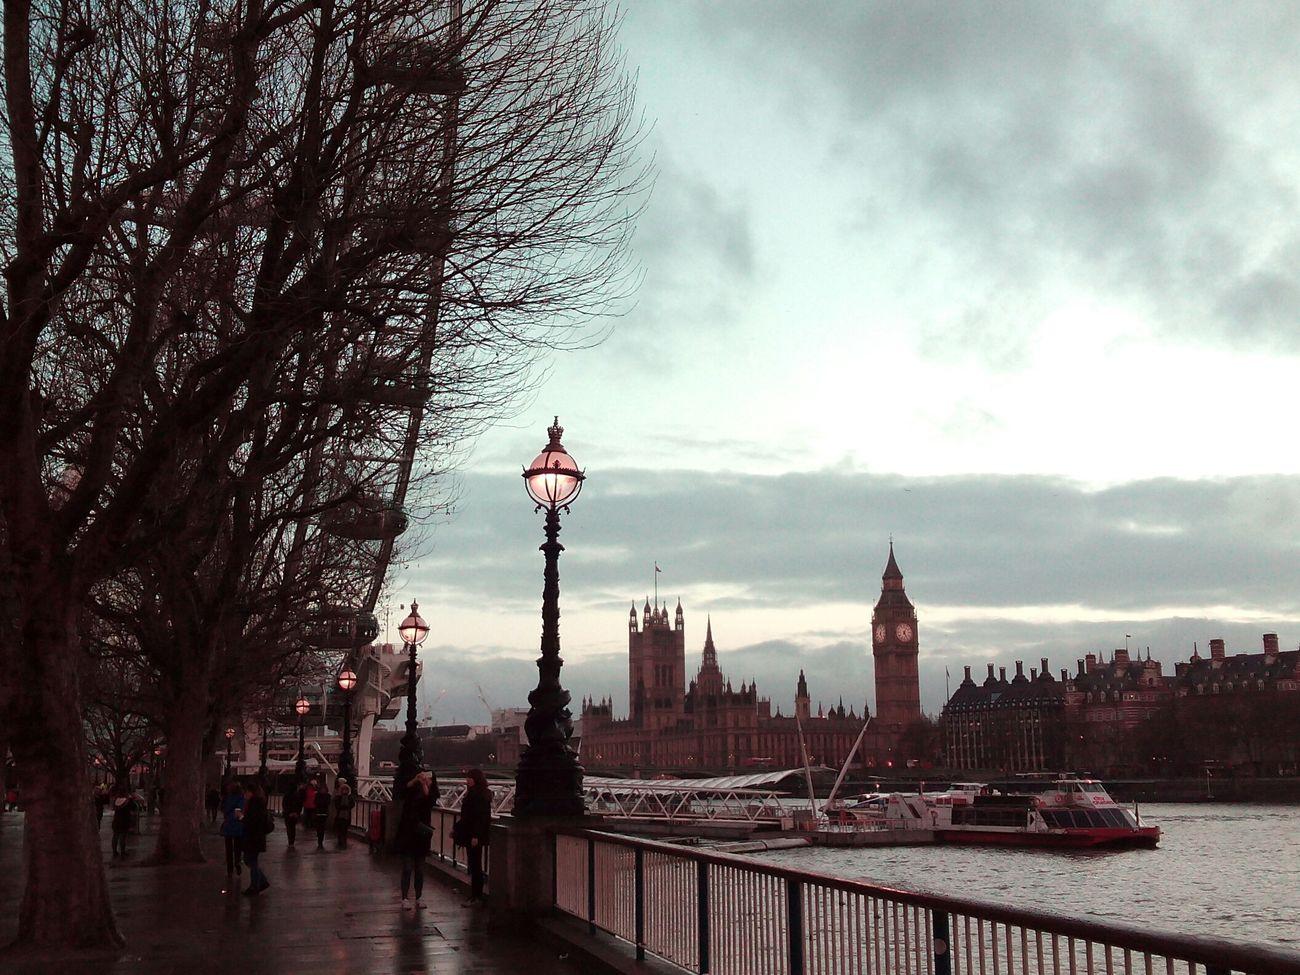 Travel London TheQueensWalk Nofilter London Eye Big Ben